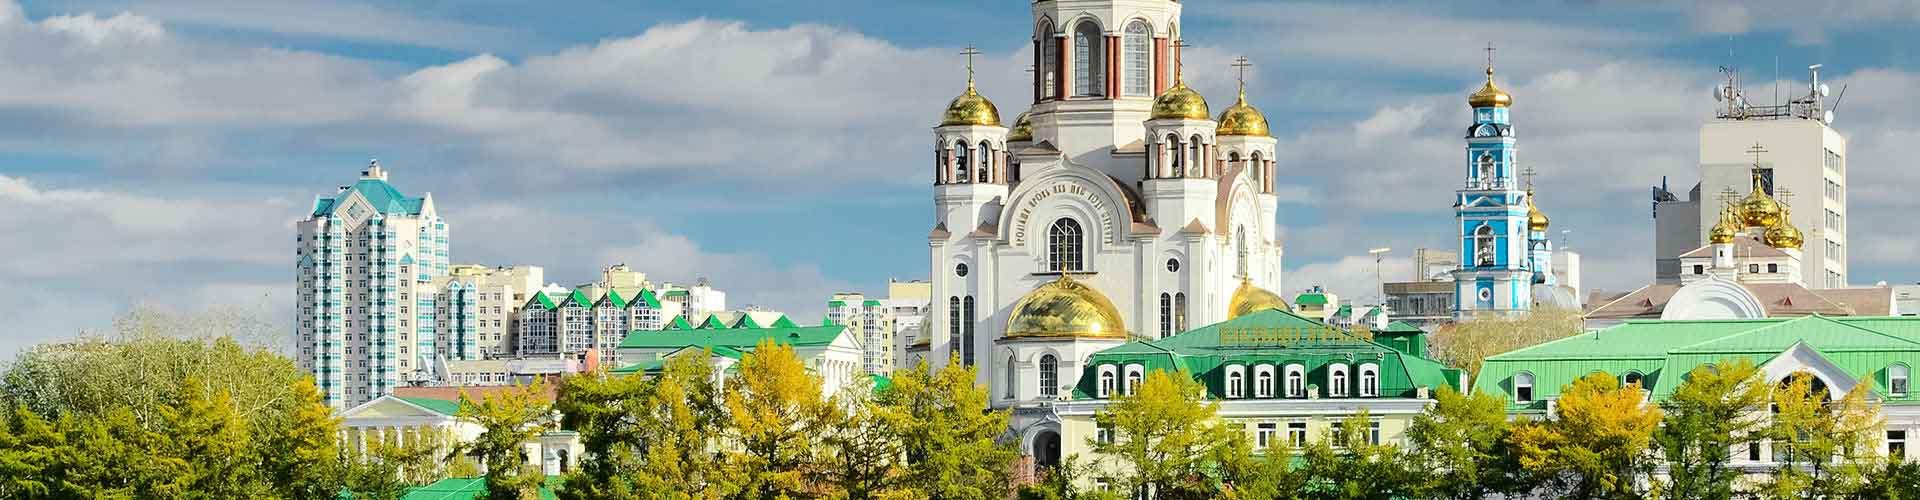 Ekaterimburgo - Campamentos en Ekaterimburgo. Mapas de Ekaterimburgo, Fotos y comentarios de cada Campamento en Ekaterimburgo.